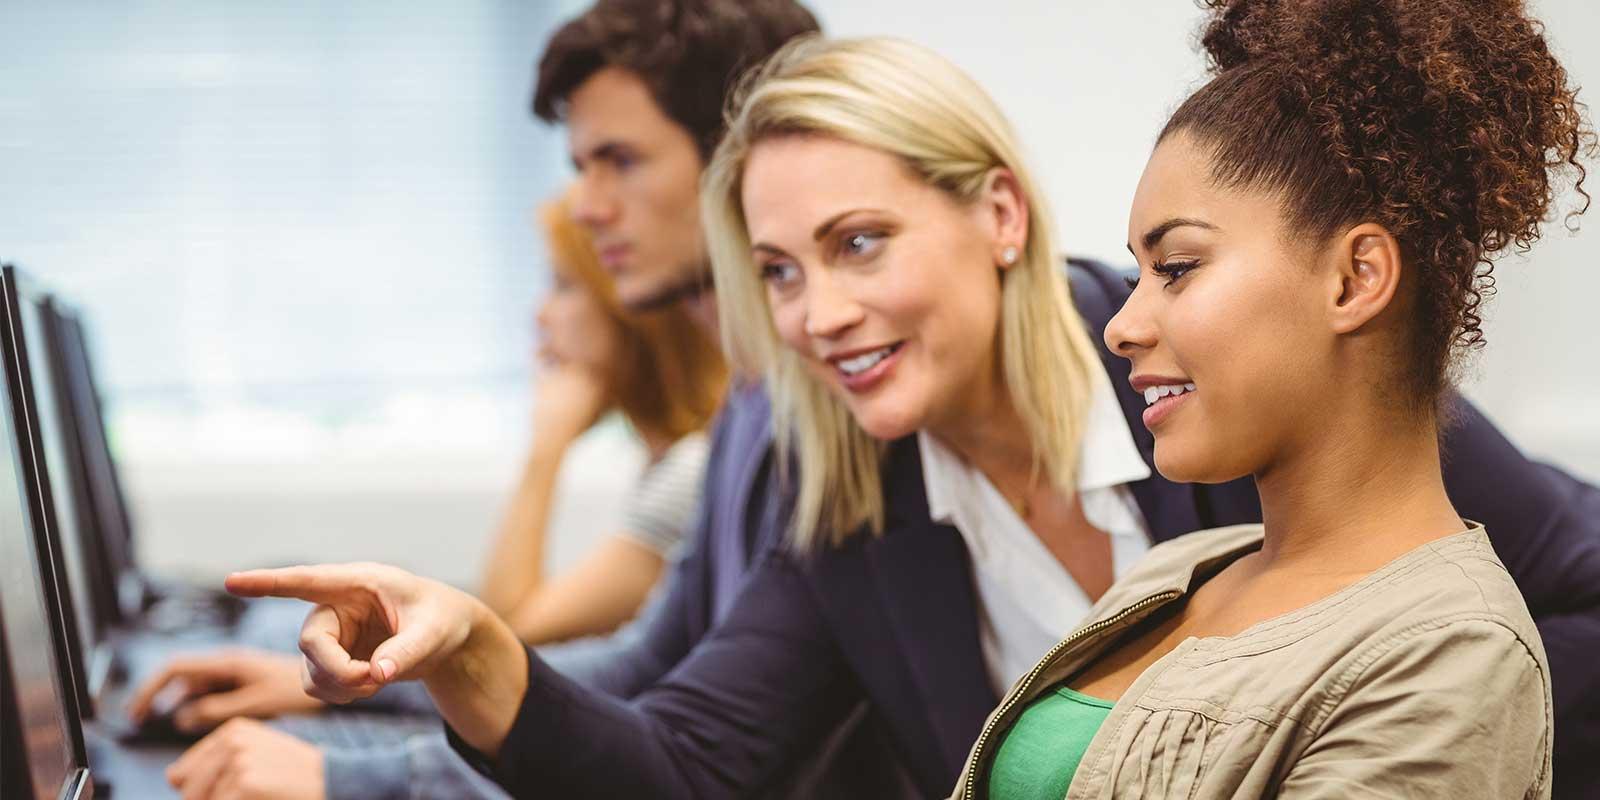 Career_Readiness_Human_Resource_Development